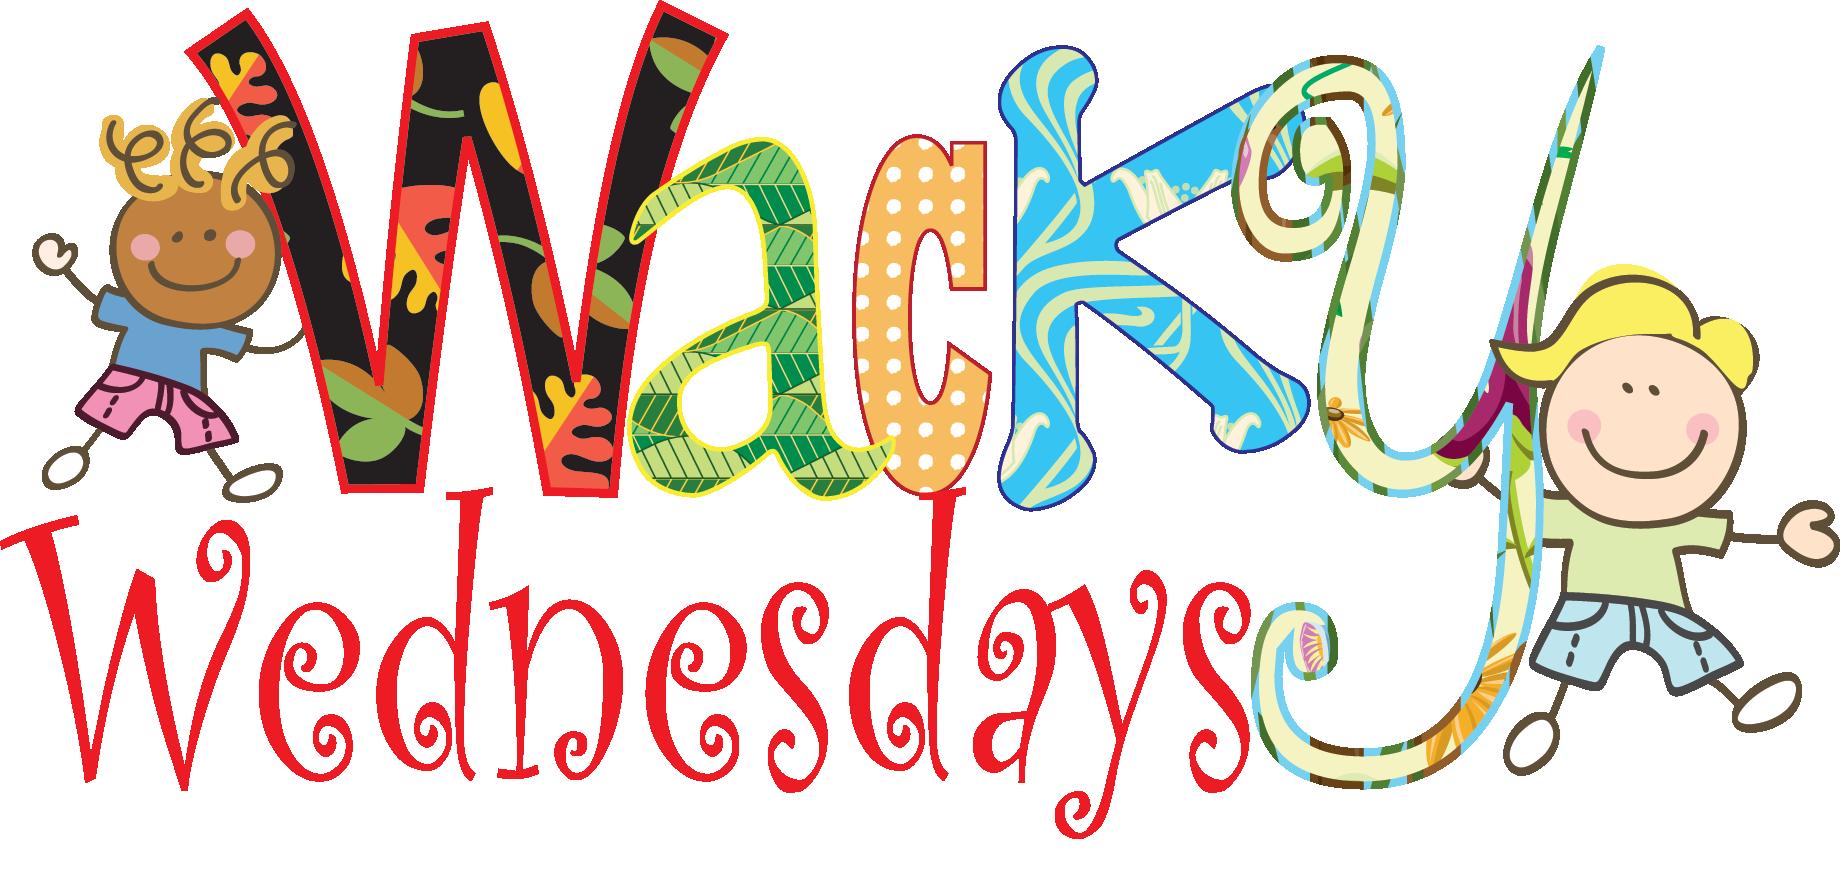 Wacky Wednesday Clip Art N2 free image.